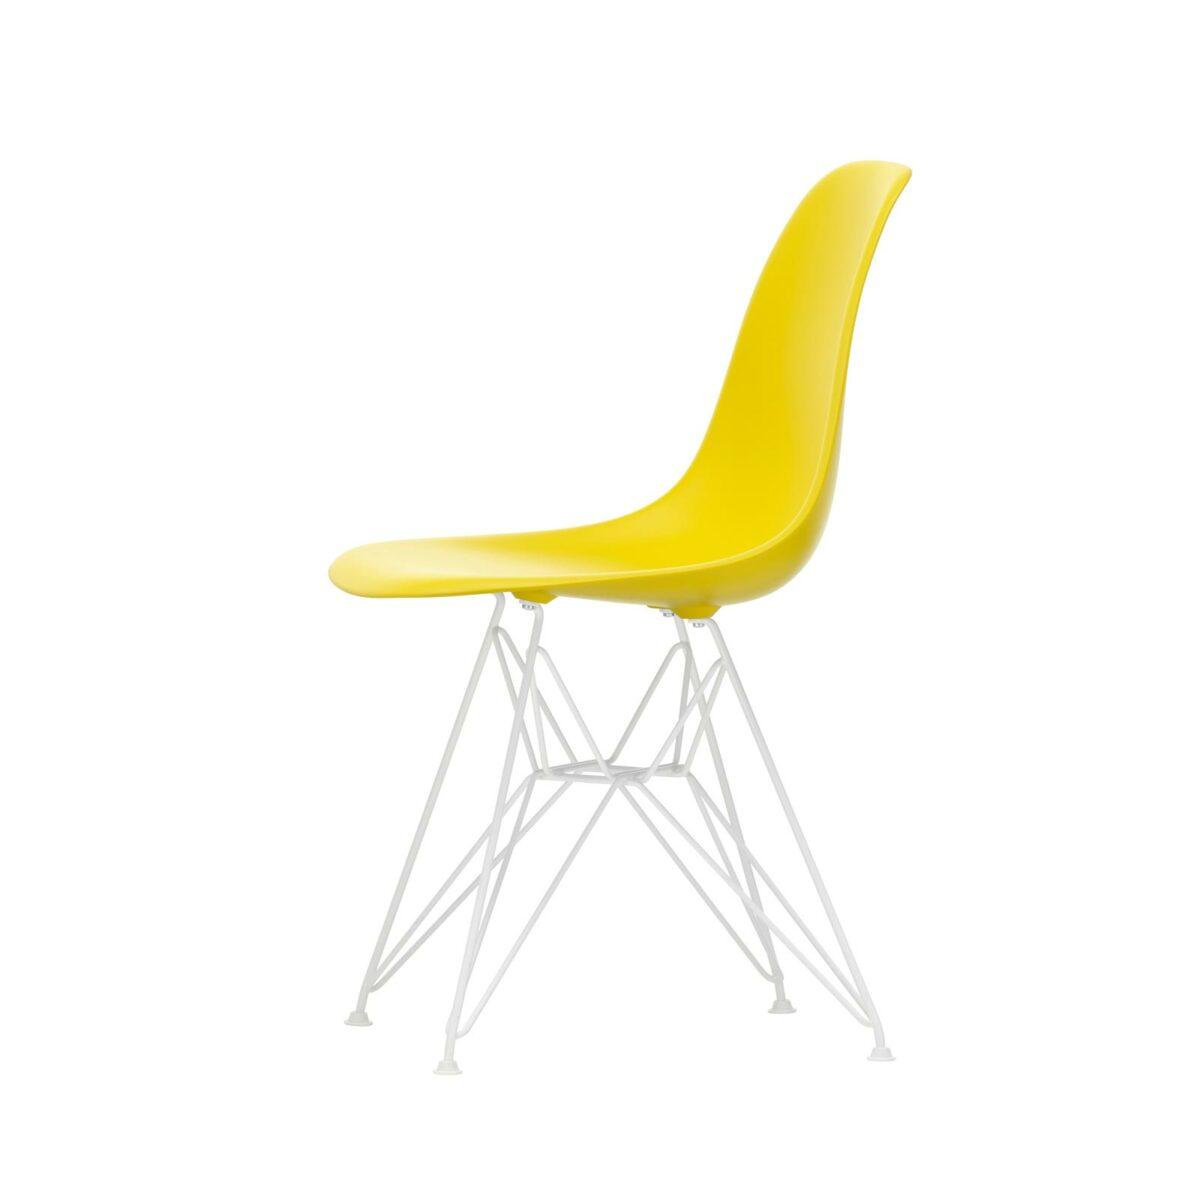 3034956 Eames Plastic Side Chair DSR 26 sunlight 04 white powder coated left master